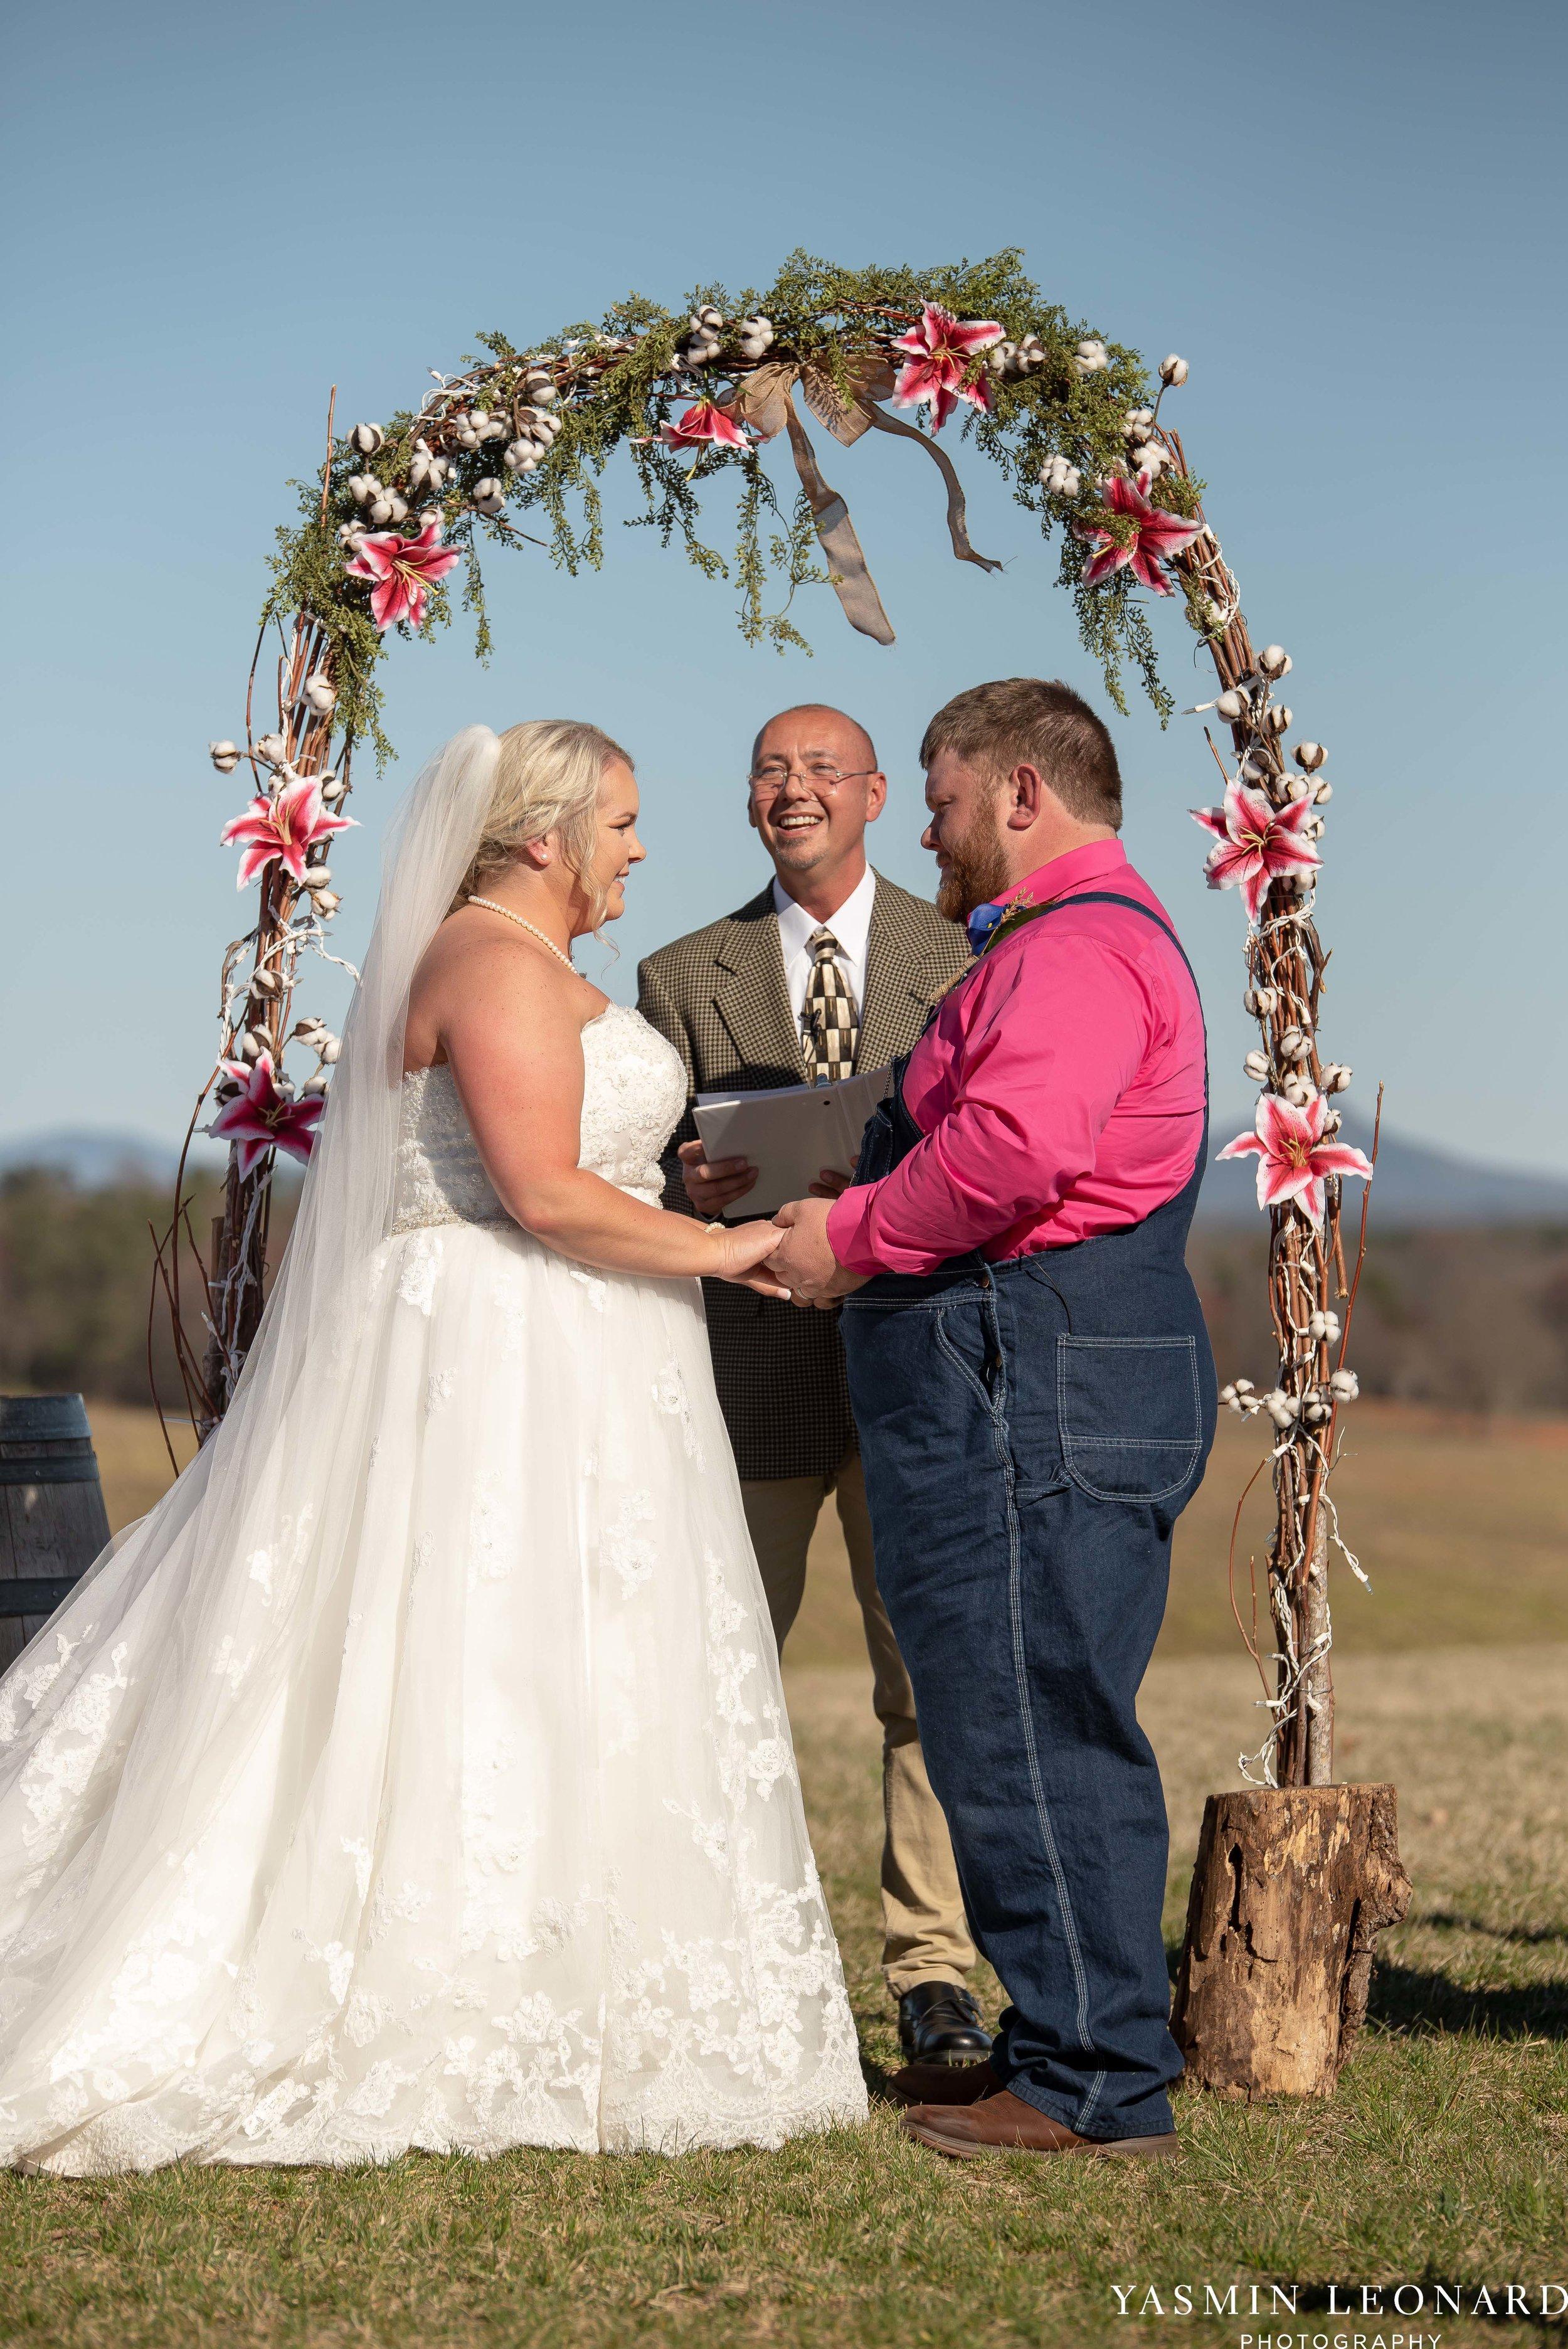 The Barn at Heritage Farm - Country Wedding - Pink and Blue Wedding - Barn Wedding - Outdoor Wedding - Cotton and Wheat Decor - Groom in Bibs - Pink Bridal Colors - Yasmin Leonard Photography-14.jpg